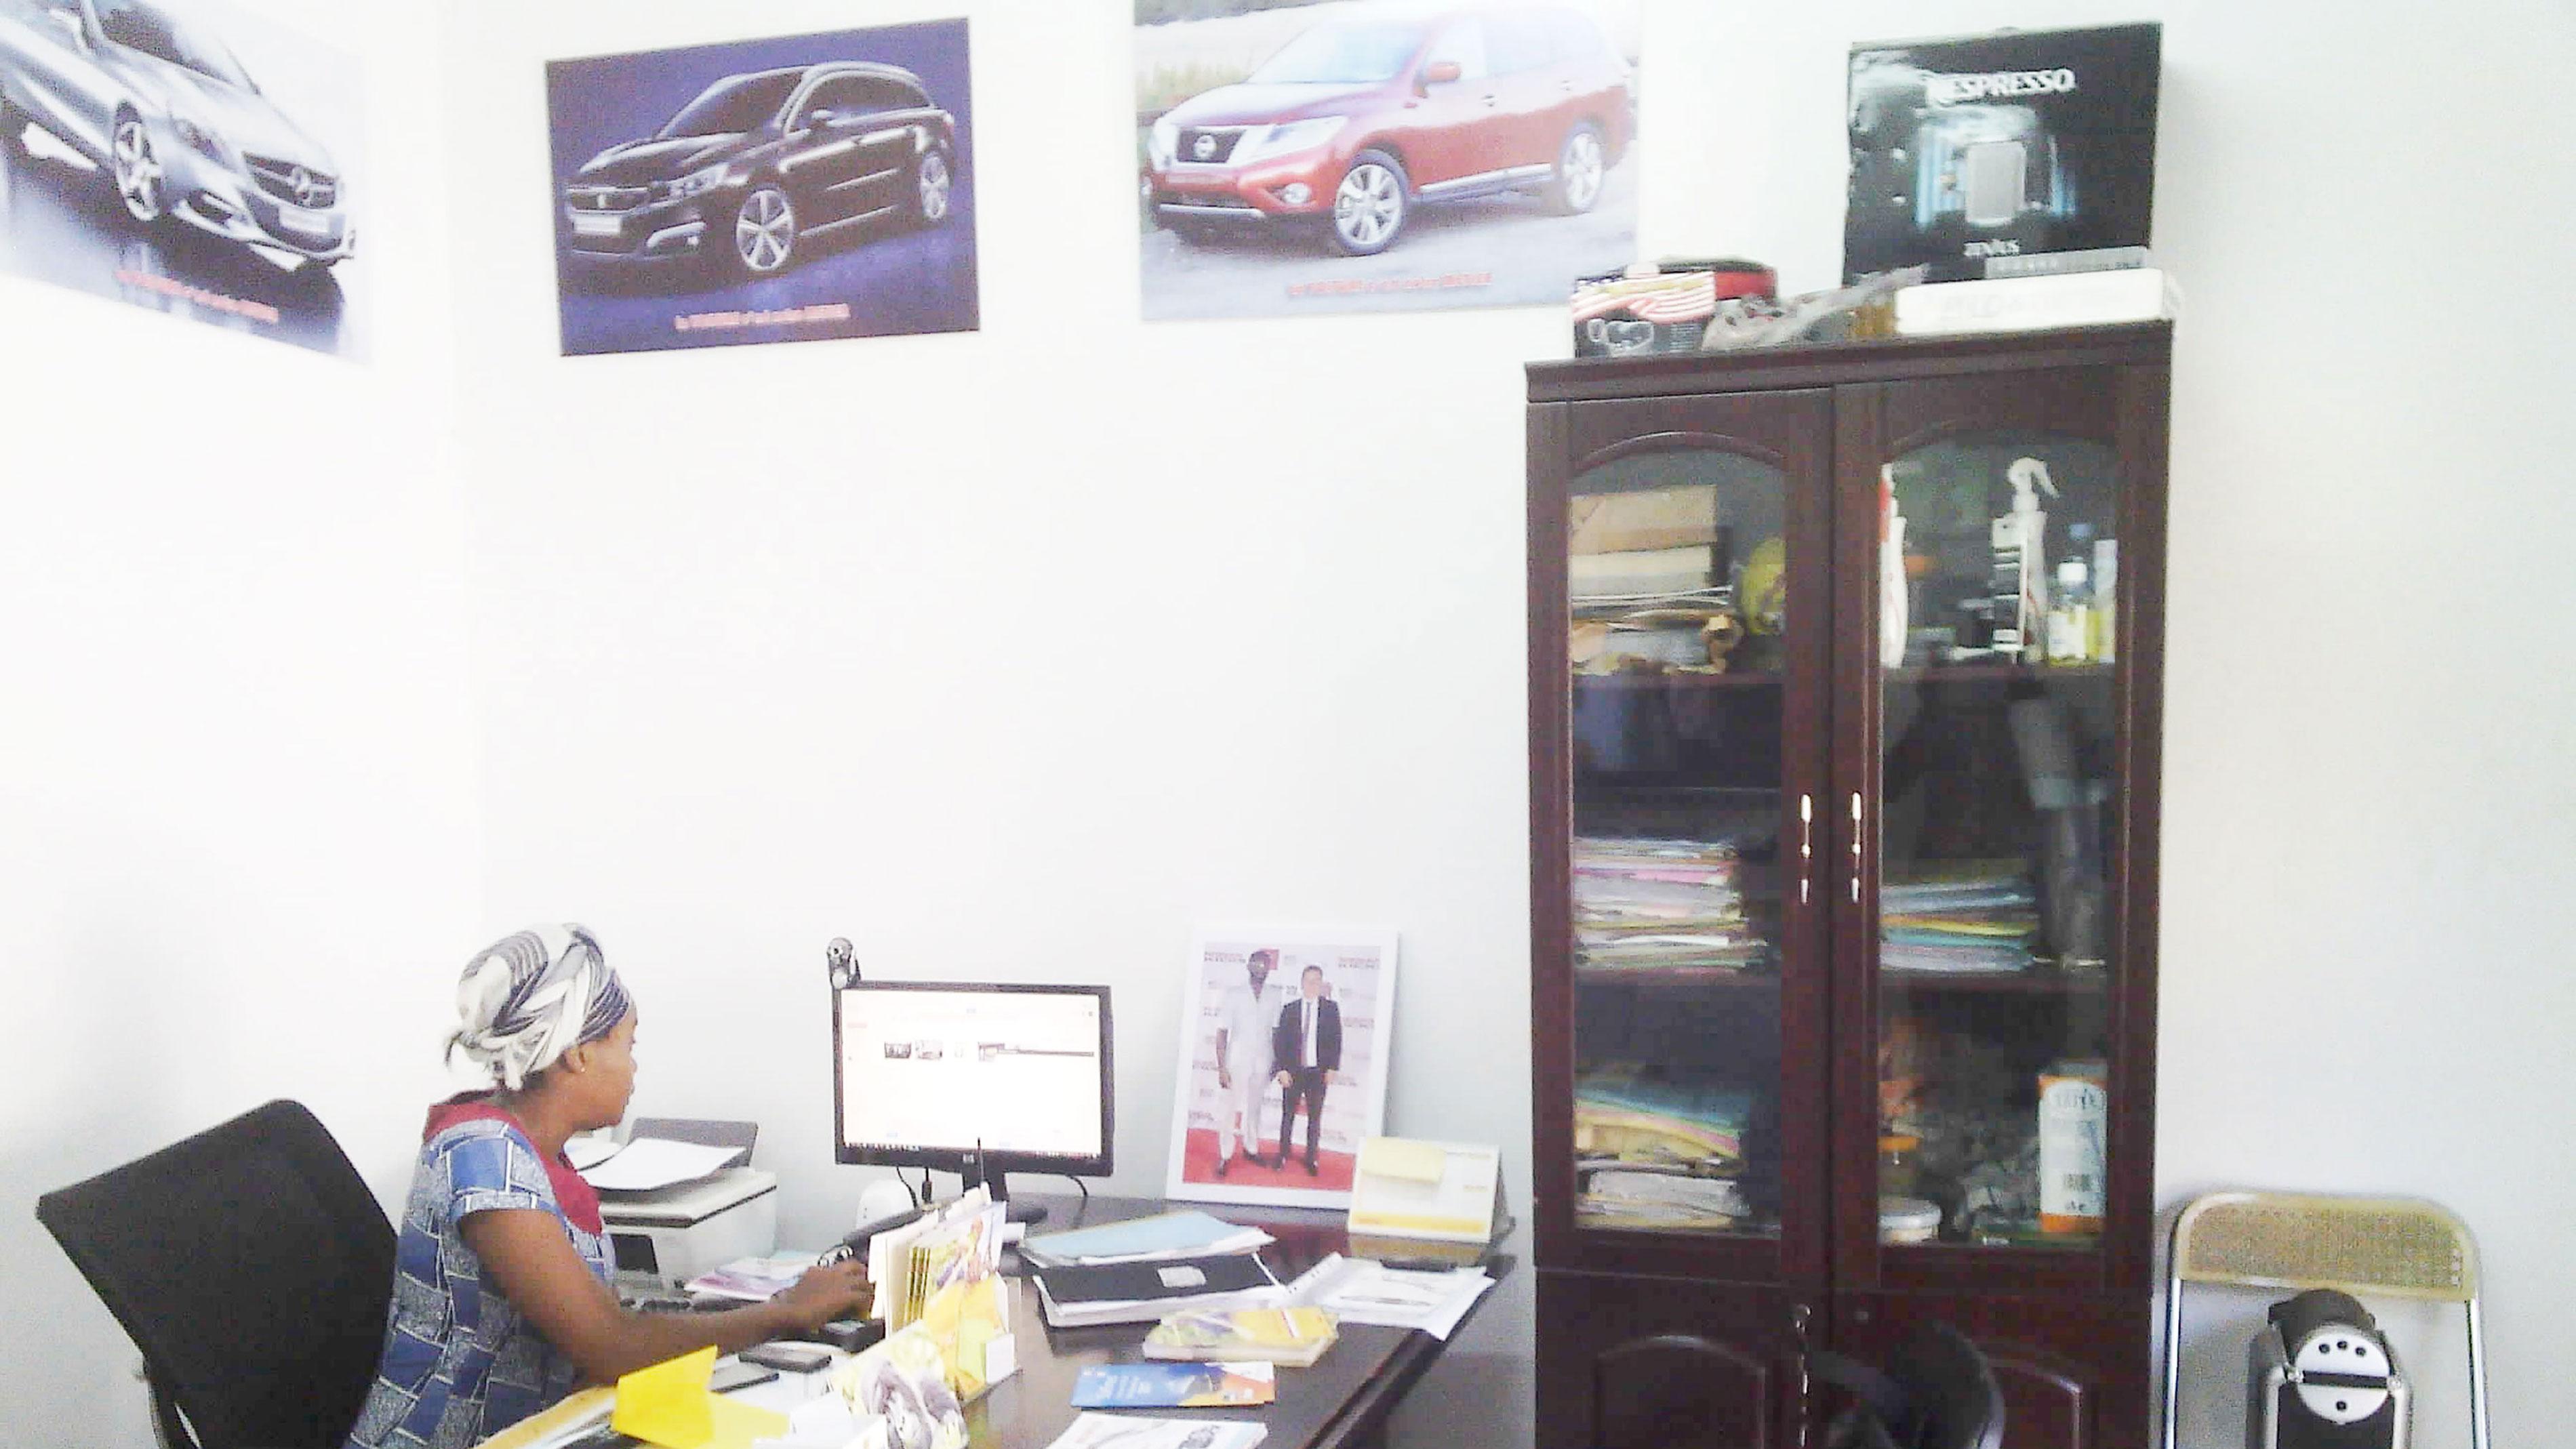 mobile service auto location de voitures. Black Bedroom Furniture Sets. Home Design Ideas